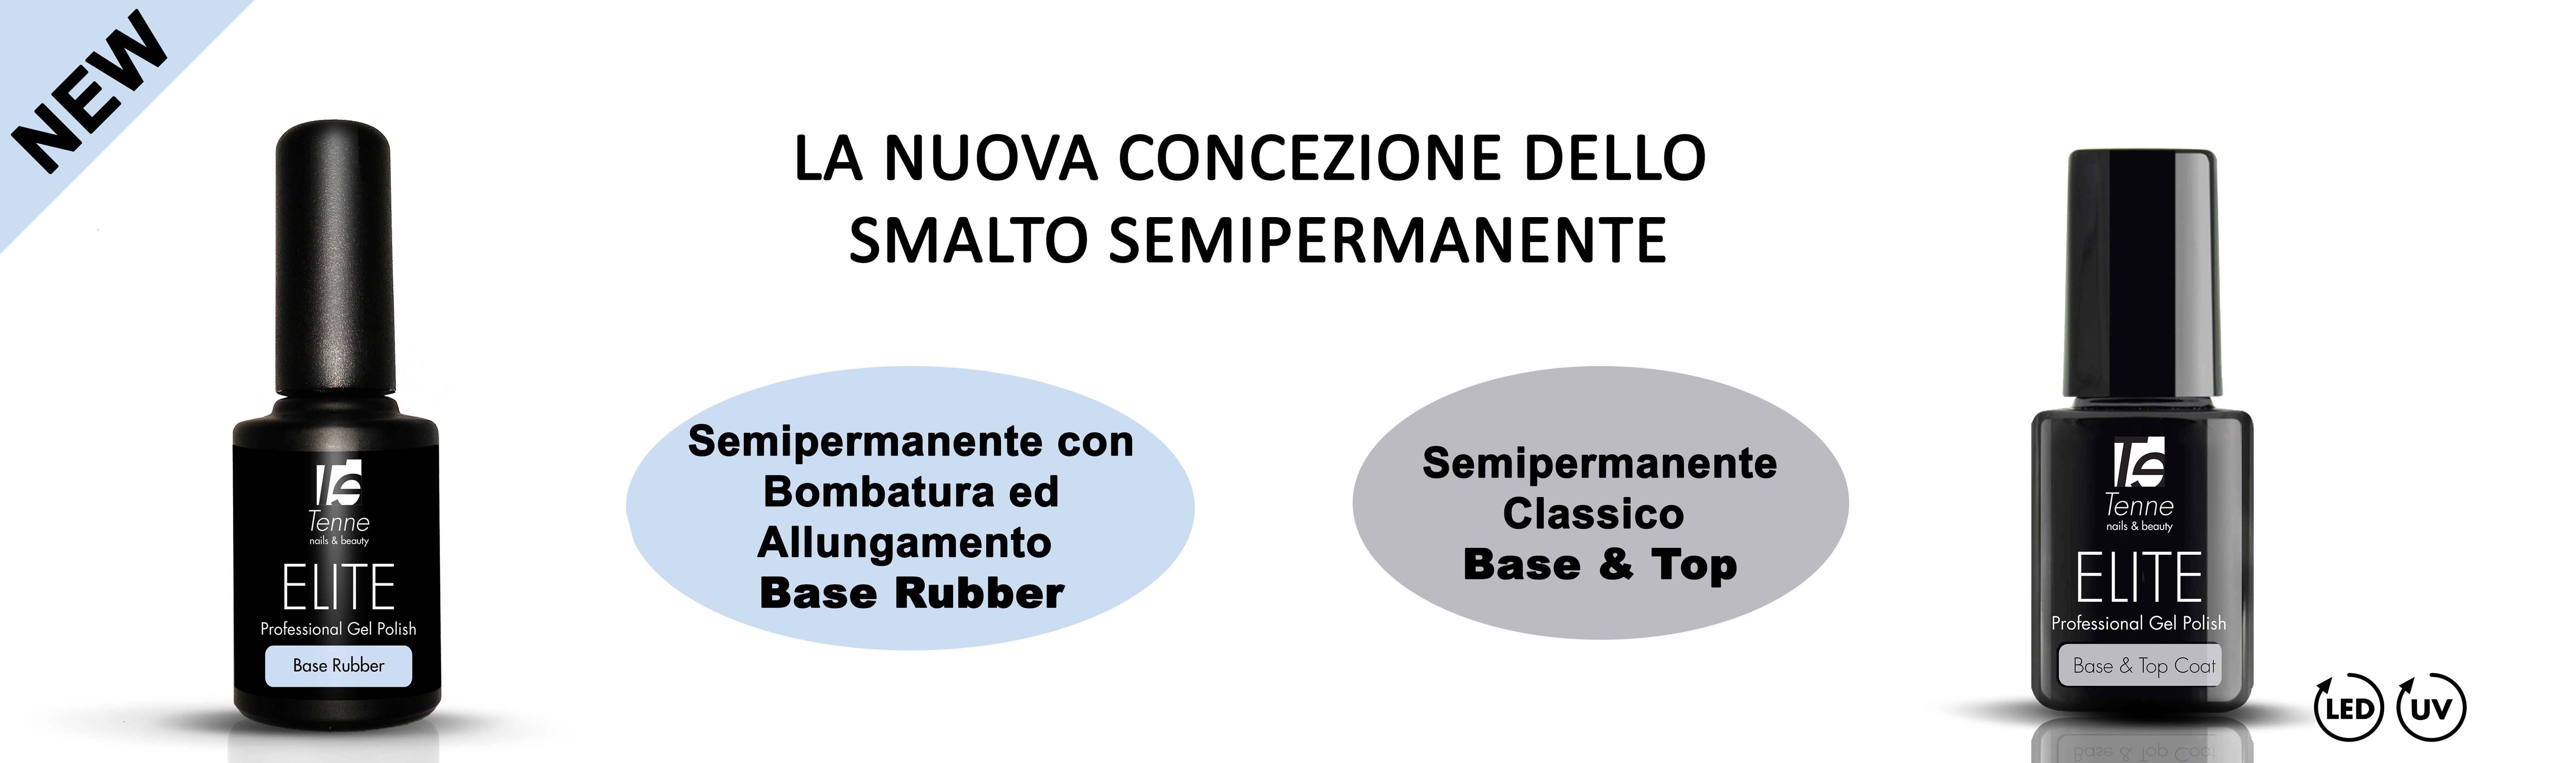 Elite Base Rubber e Base & Top